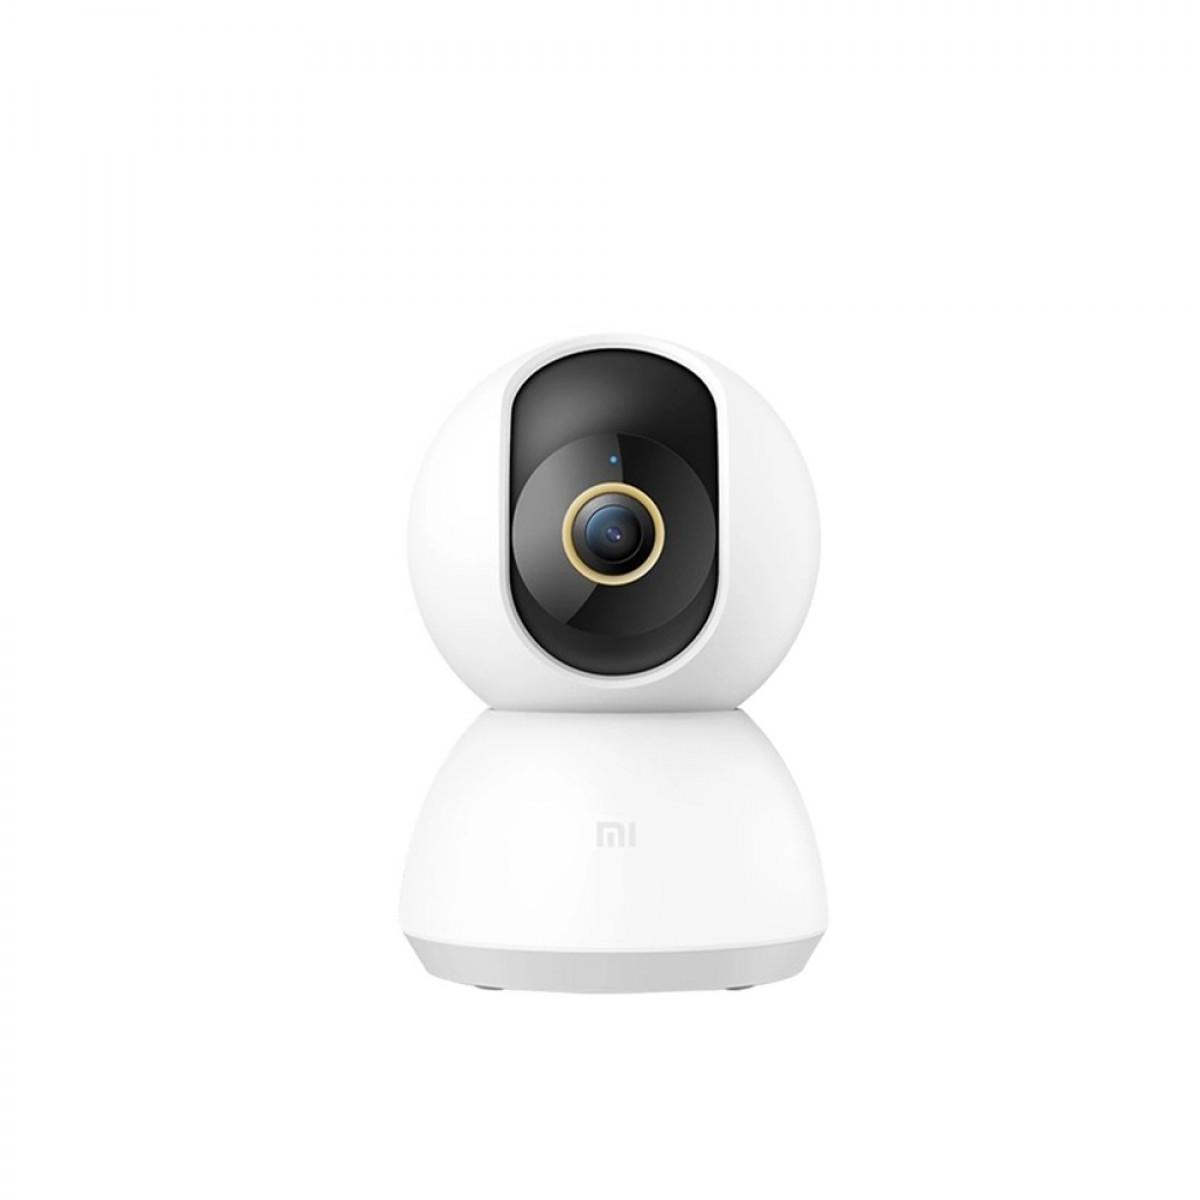 Xiaomi Mi 360 Home Security Camera 2K - VEVE